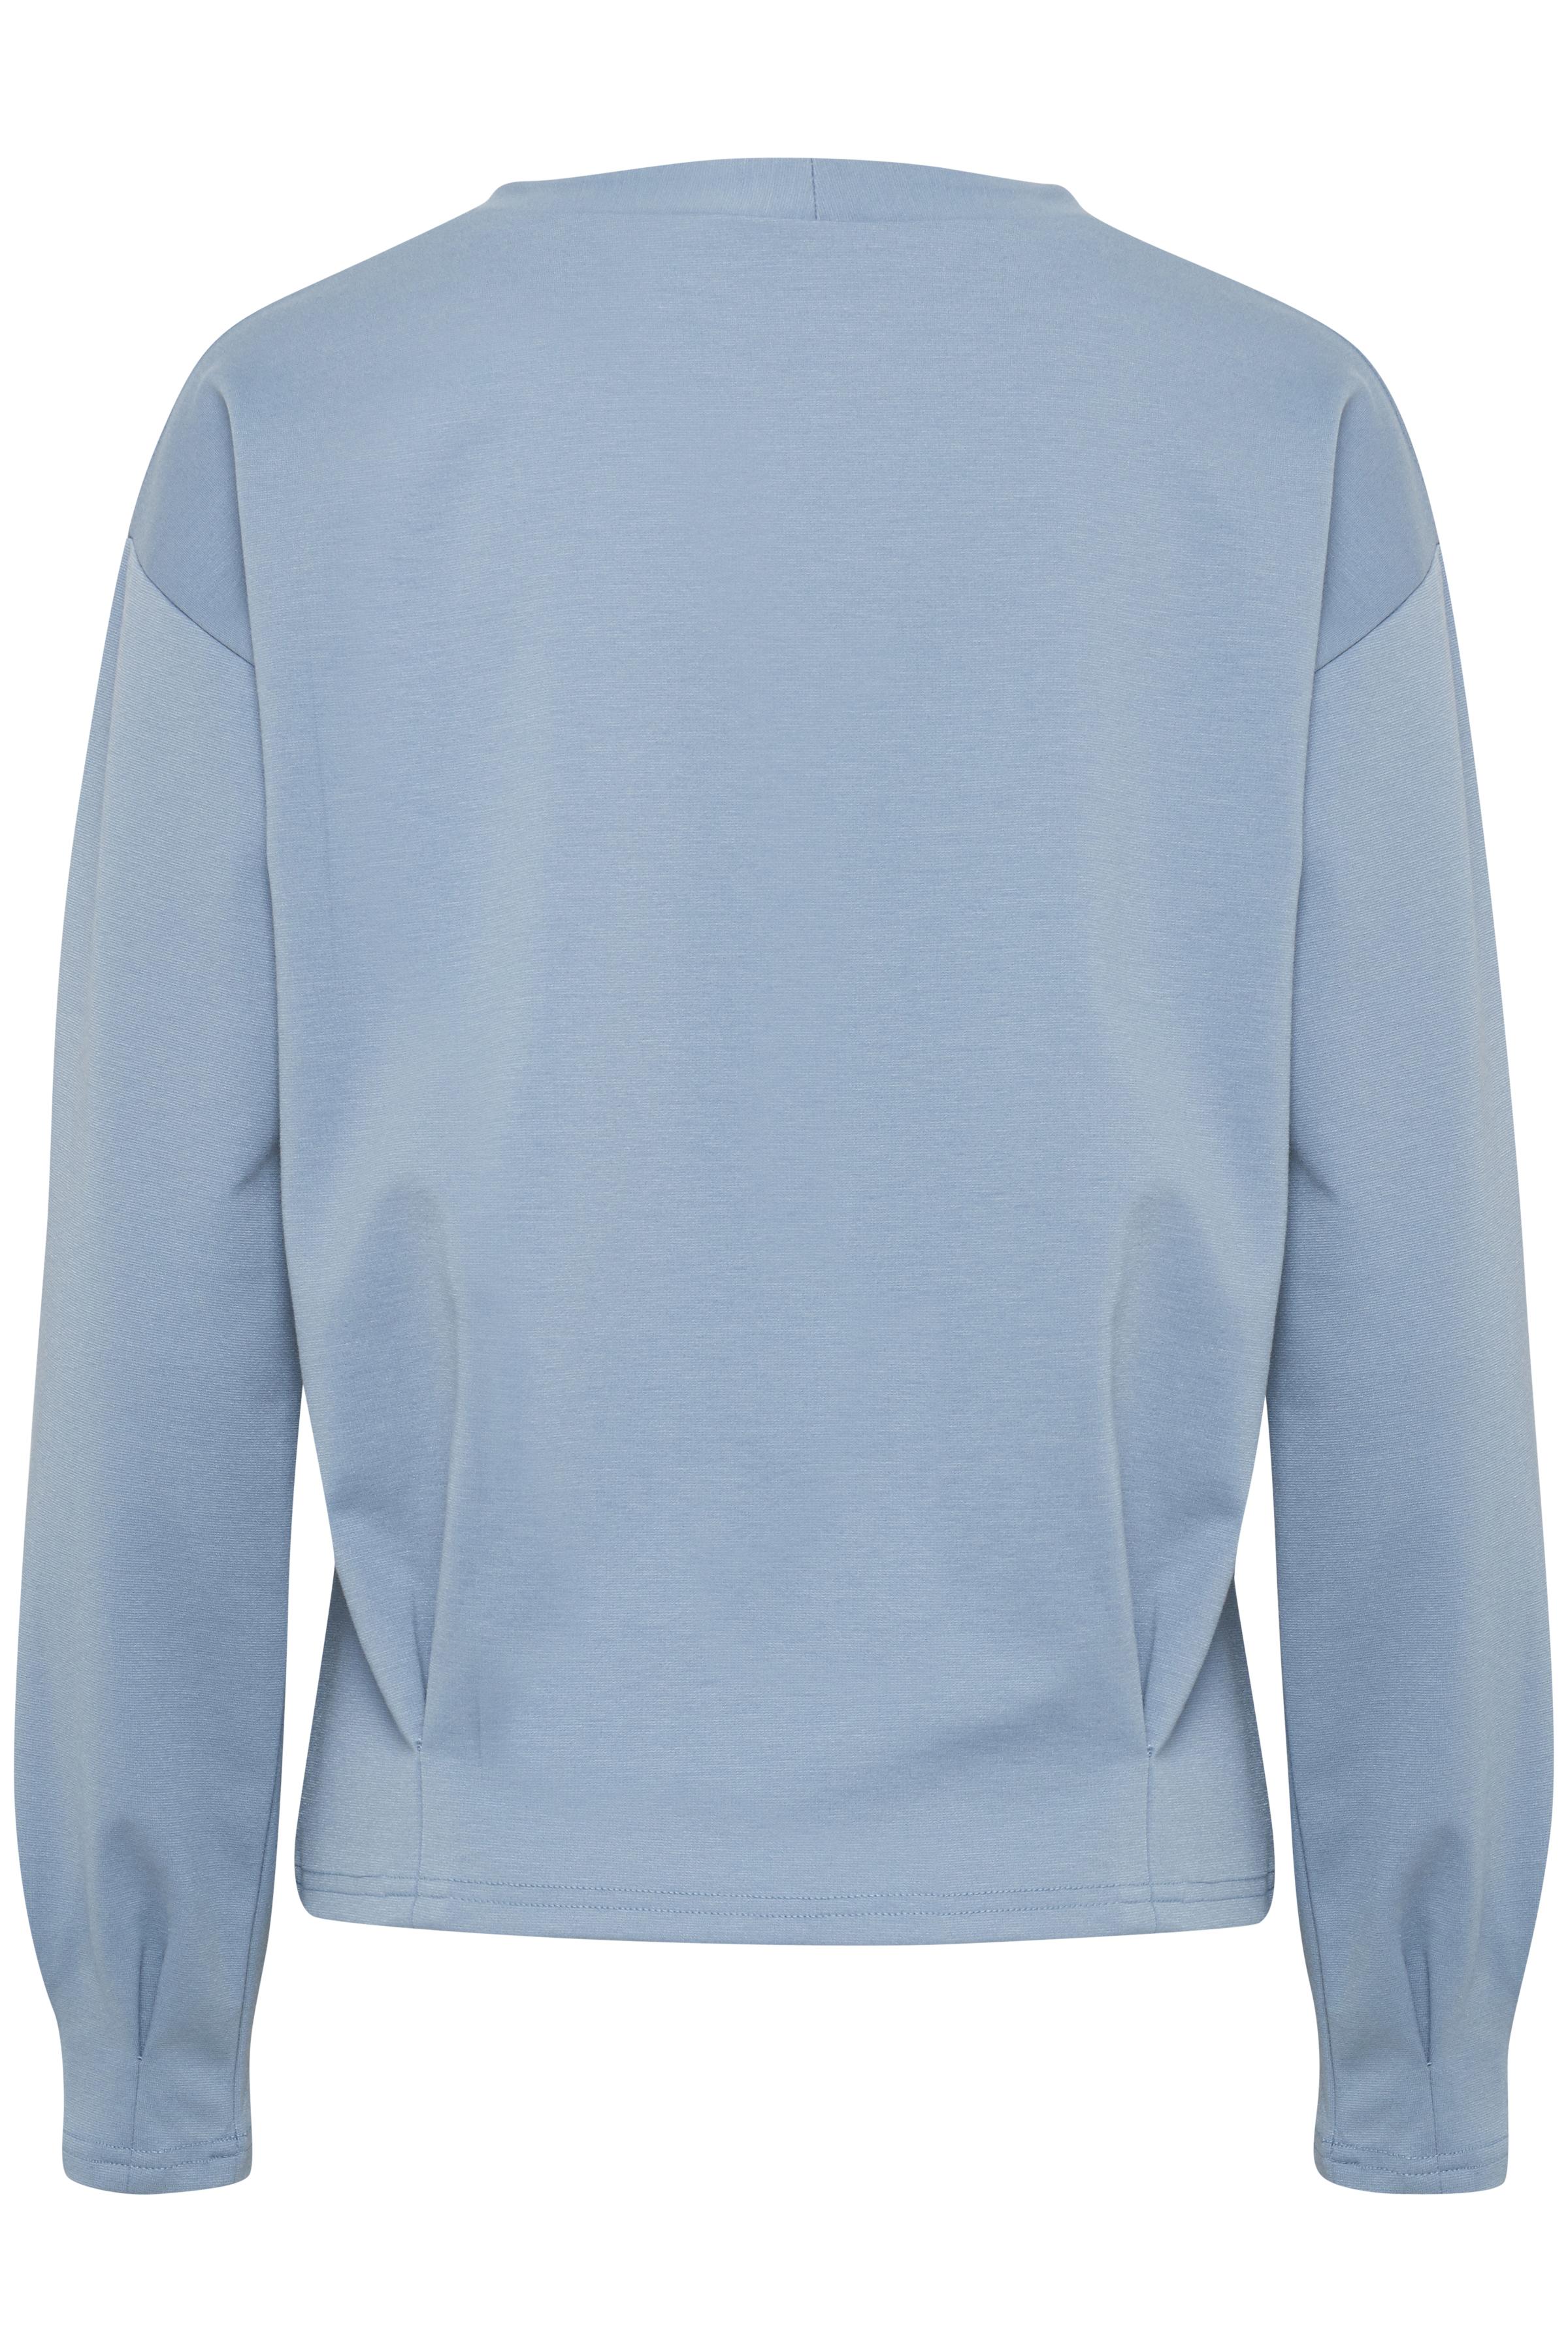 Blue Shadow Sweatshirt – Køb Blue Shadow Sweatshirt fra str. XS-L her